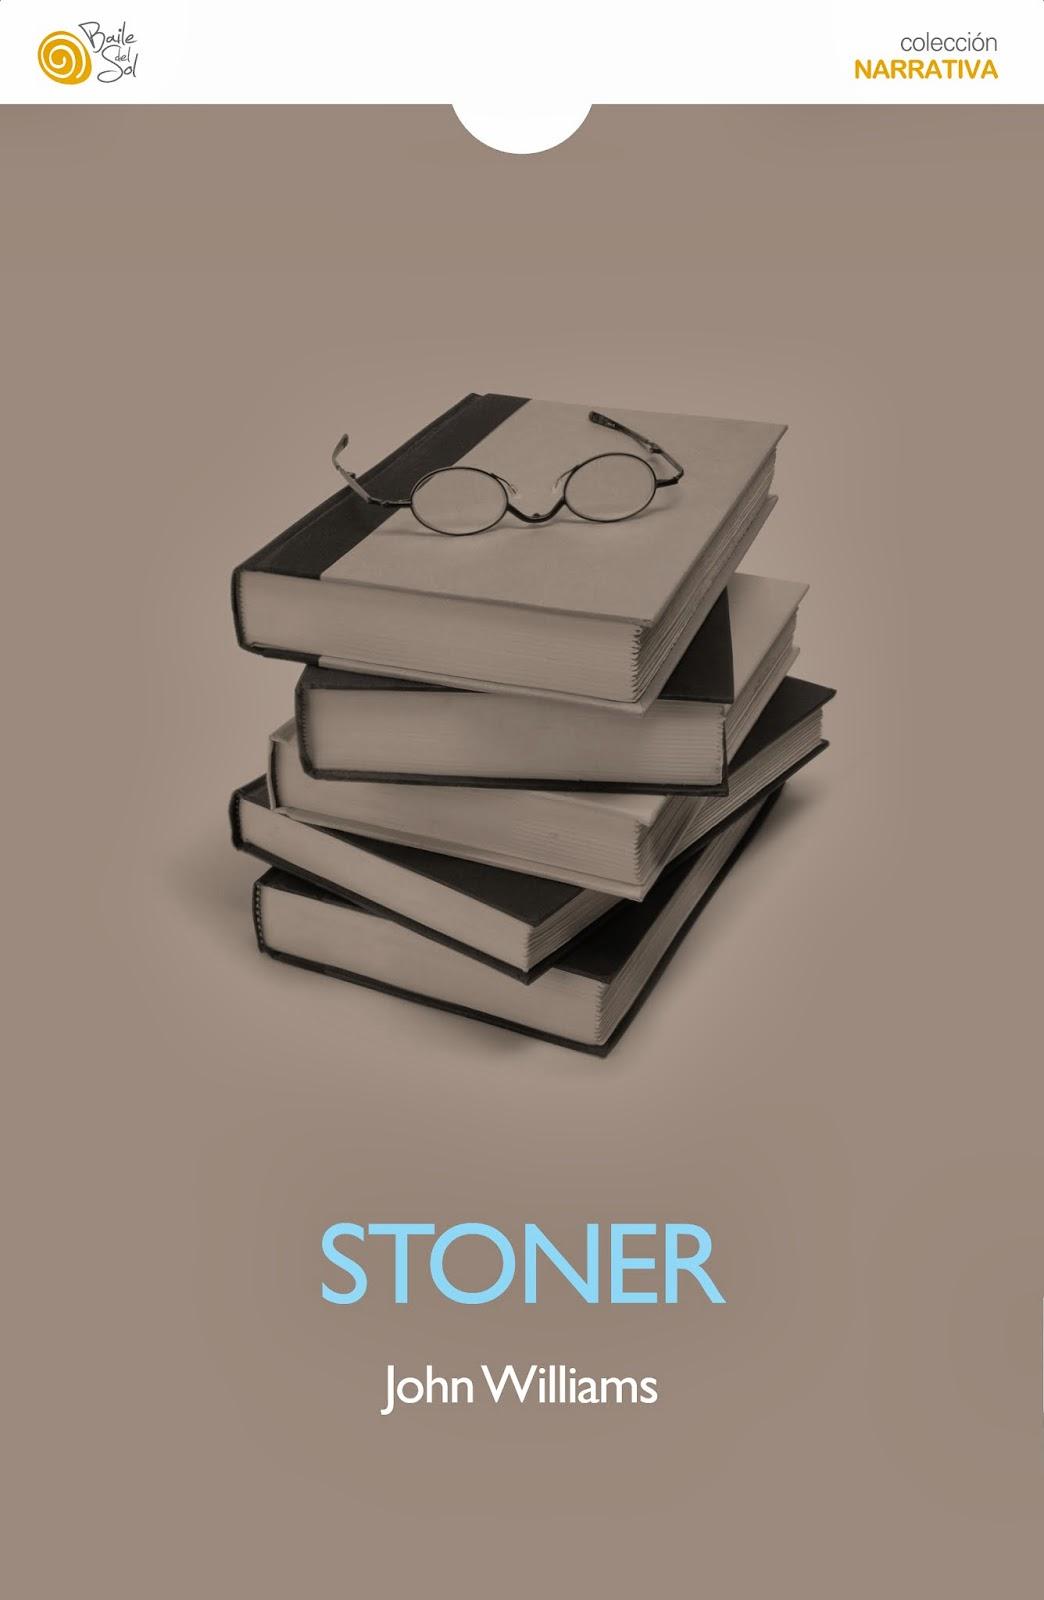 Pornostar john stoner